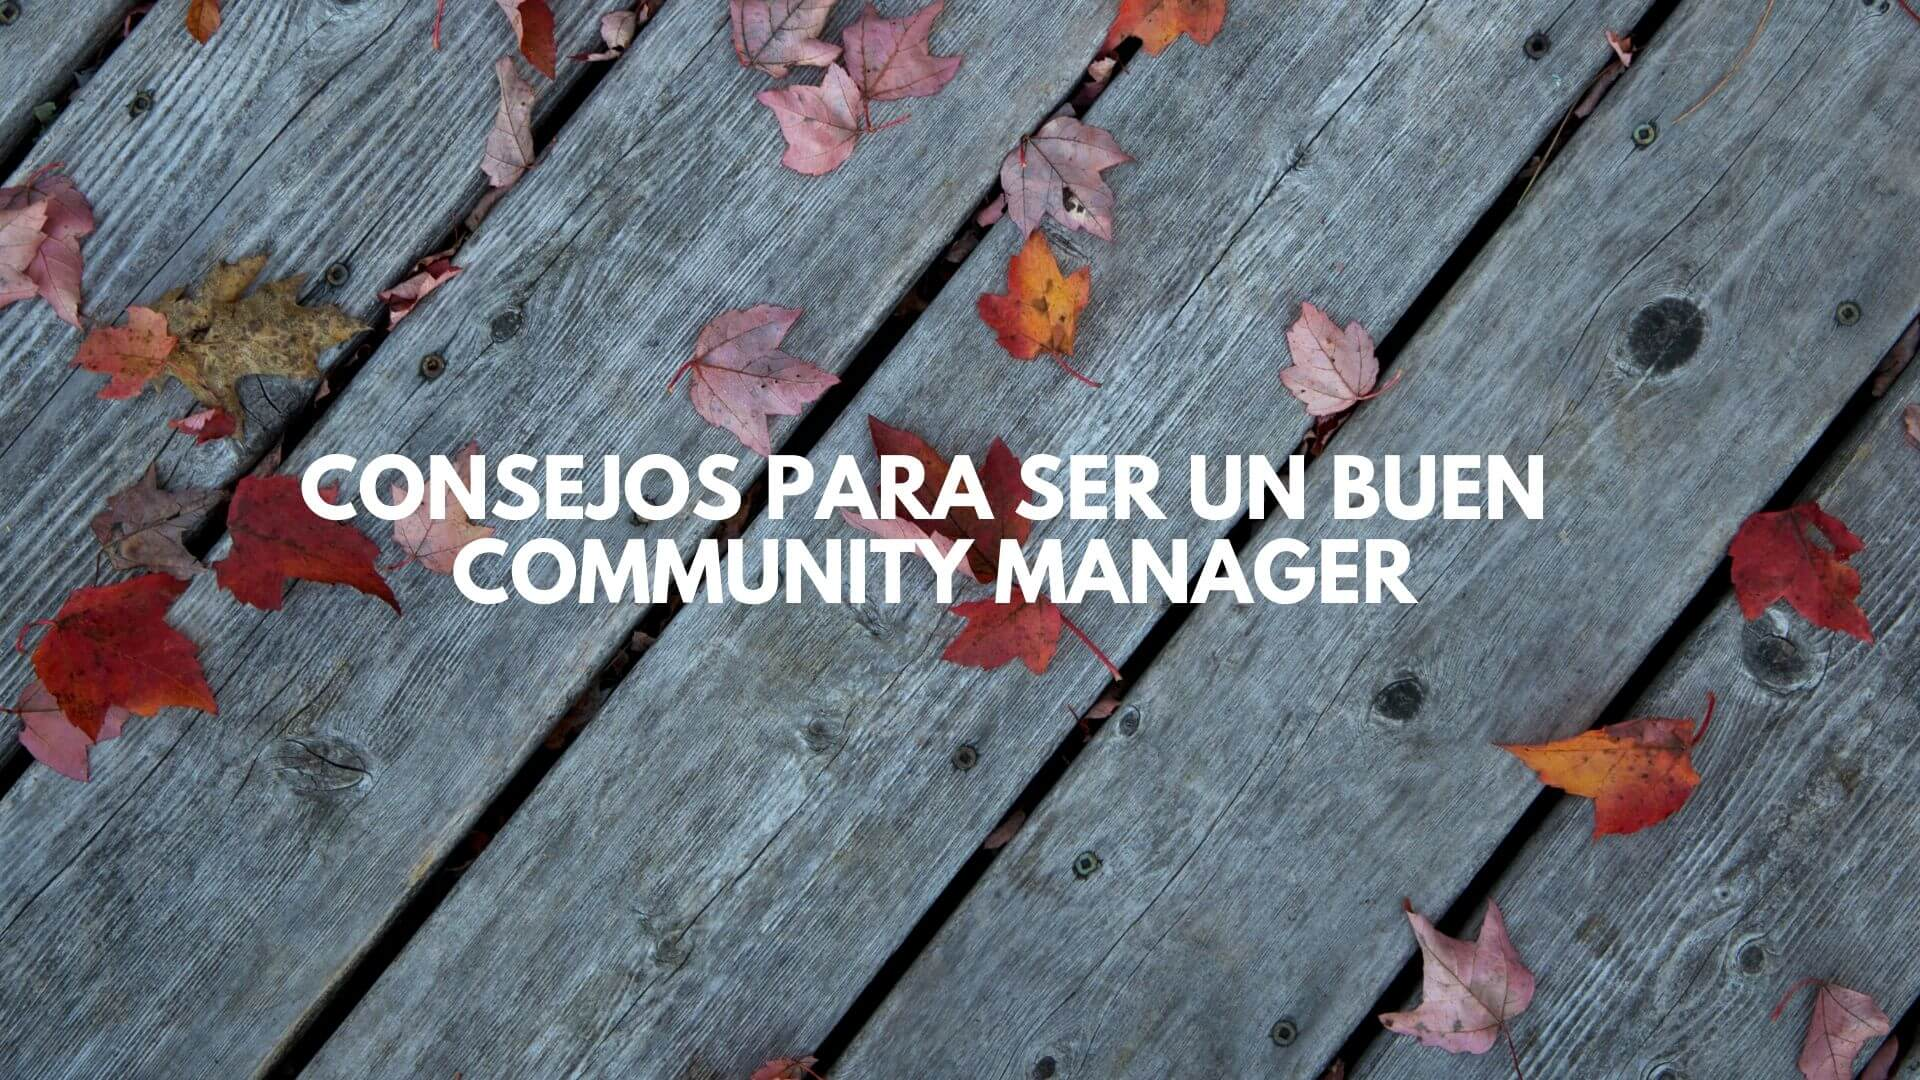 10 consejos para ser un buen community manager